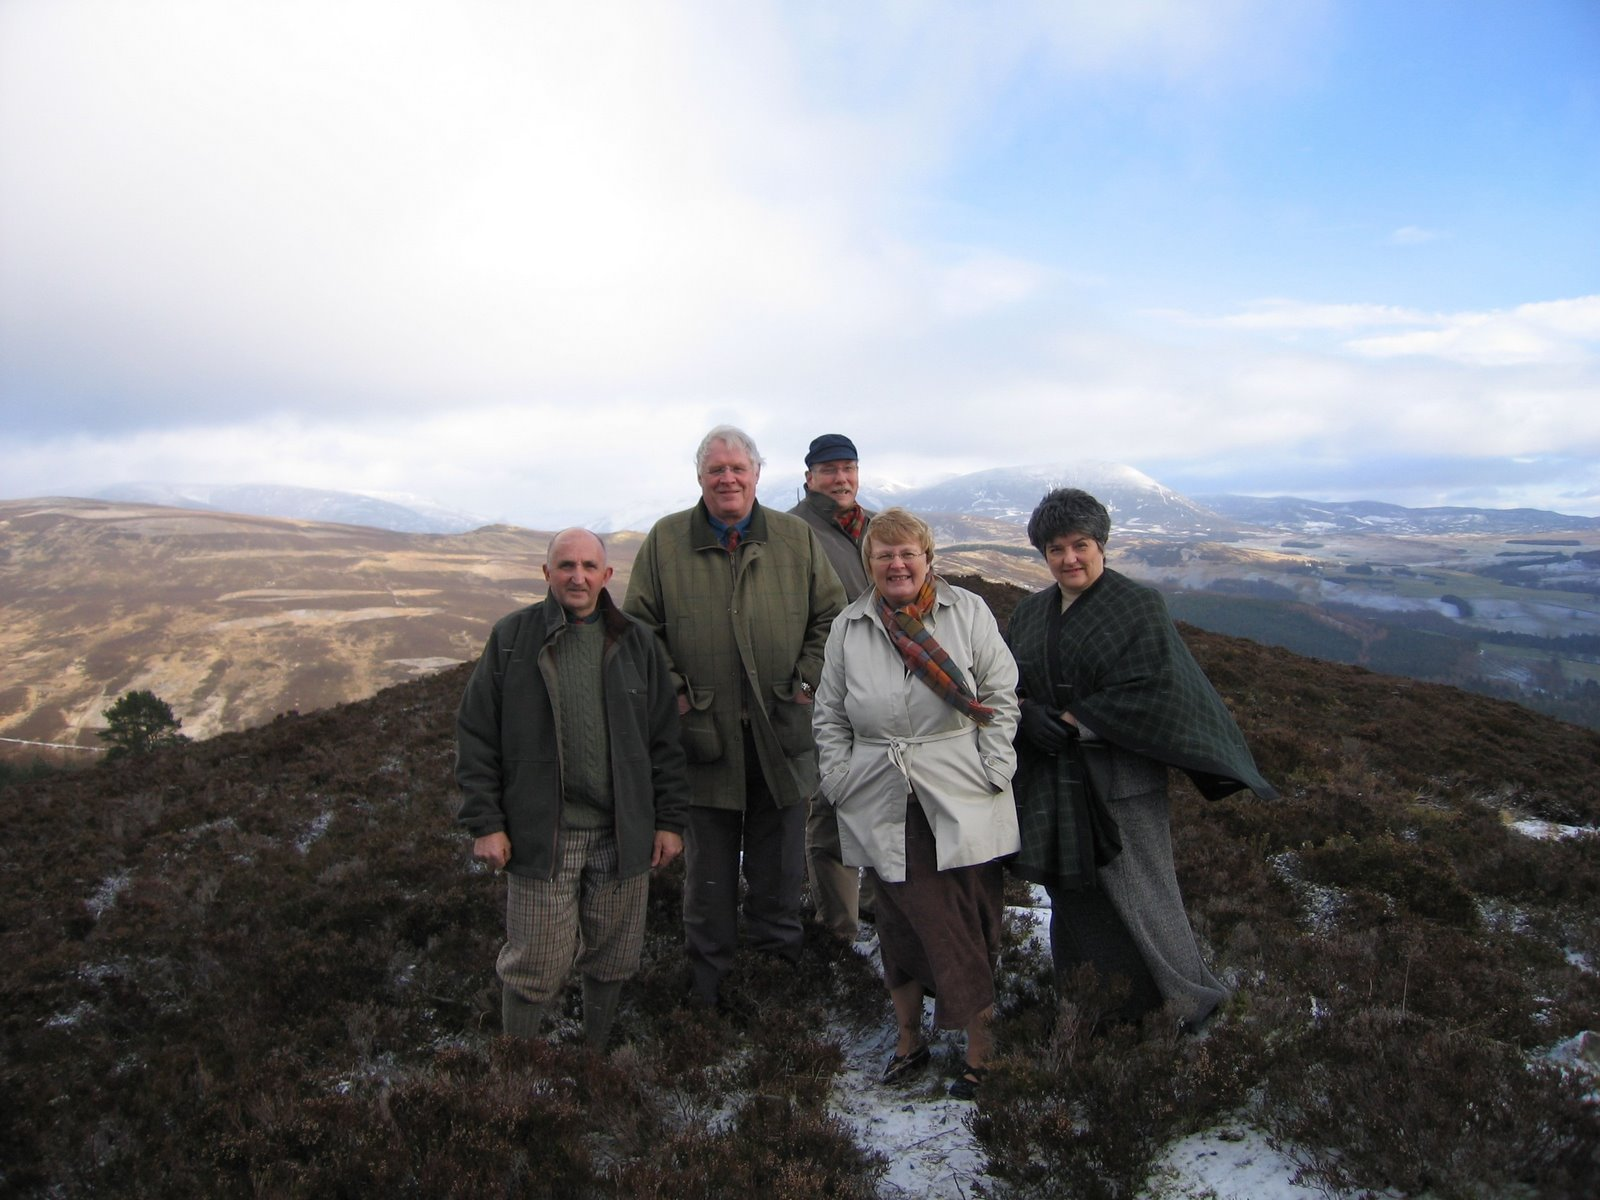 [Group+on+hills+above+Blair+Atholl,+Jan+07]